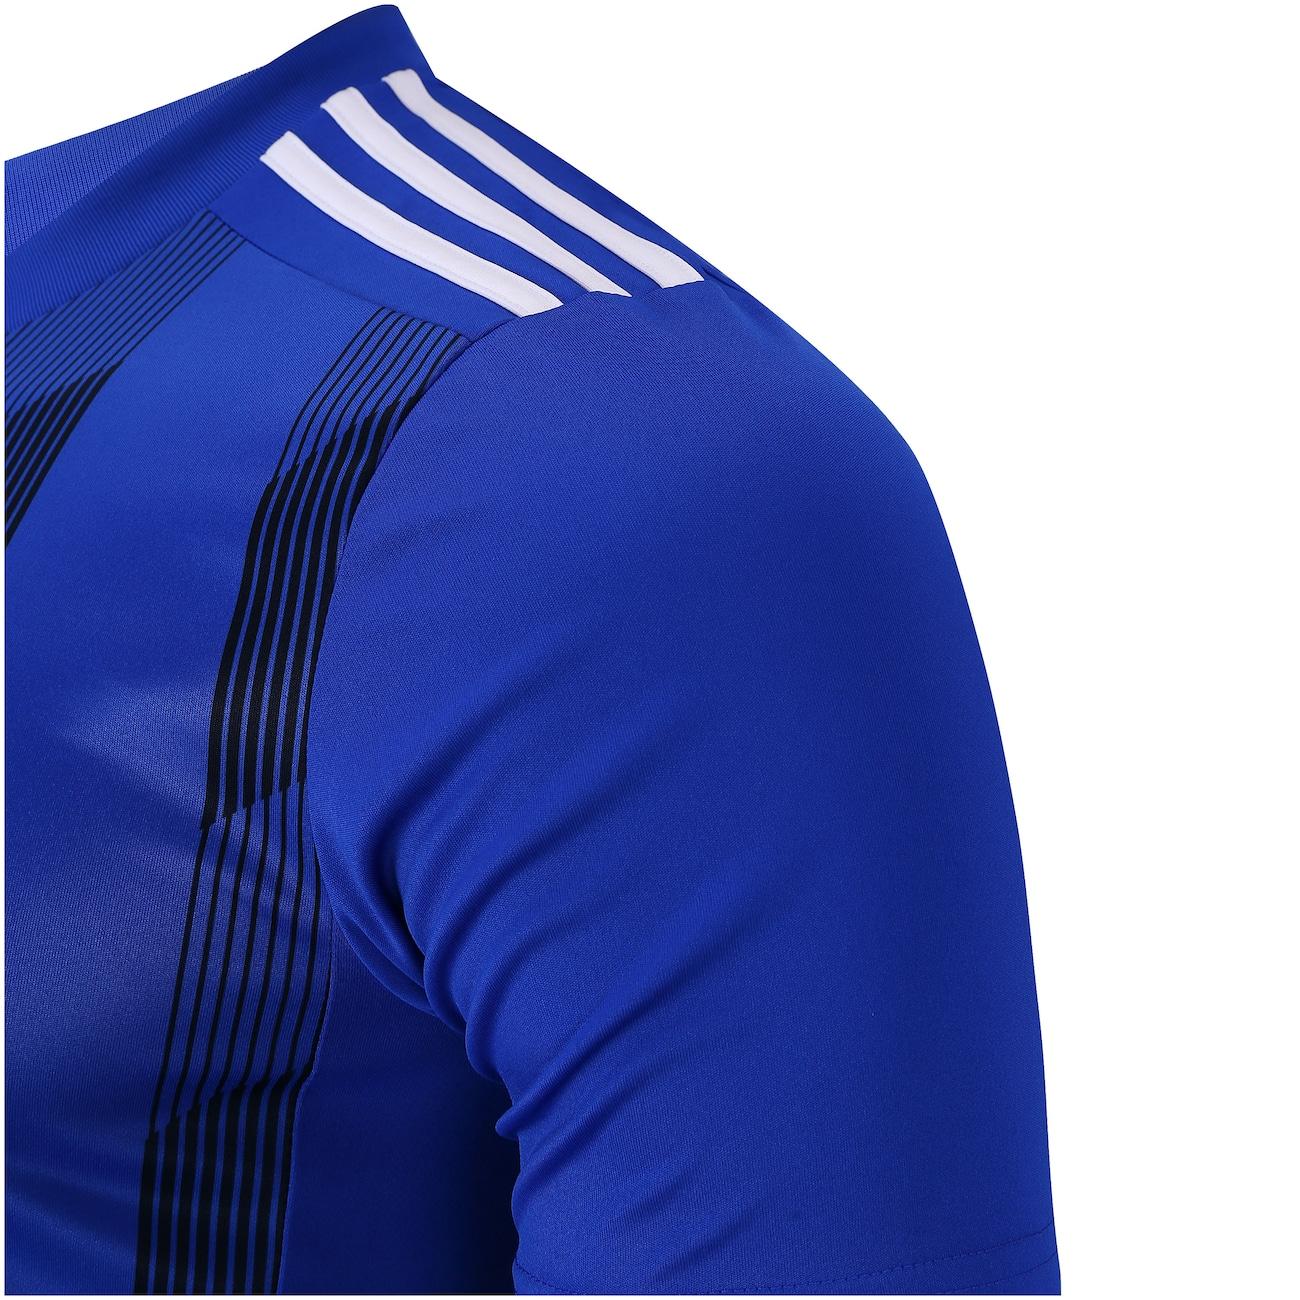 Camisa adidas Striped 19 Masculina Centauro